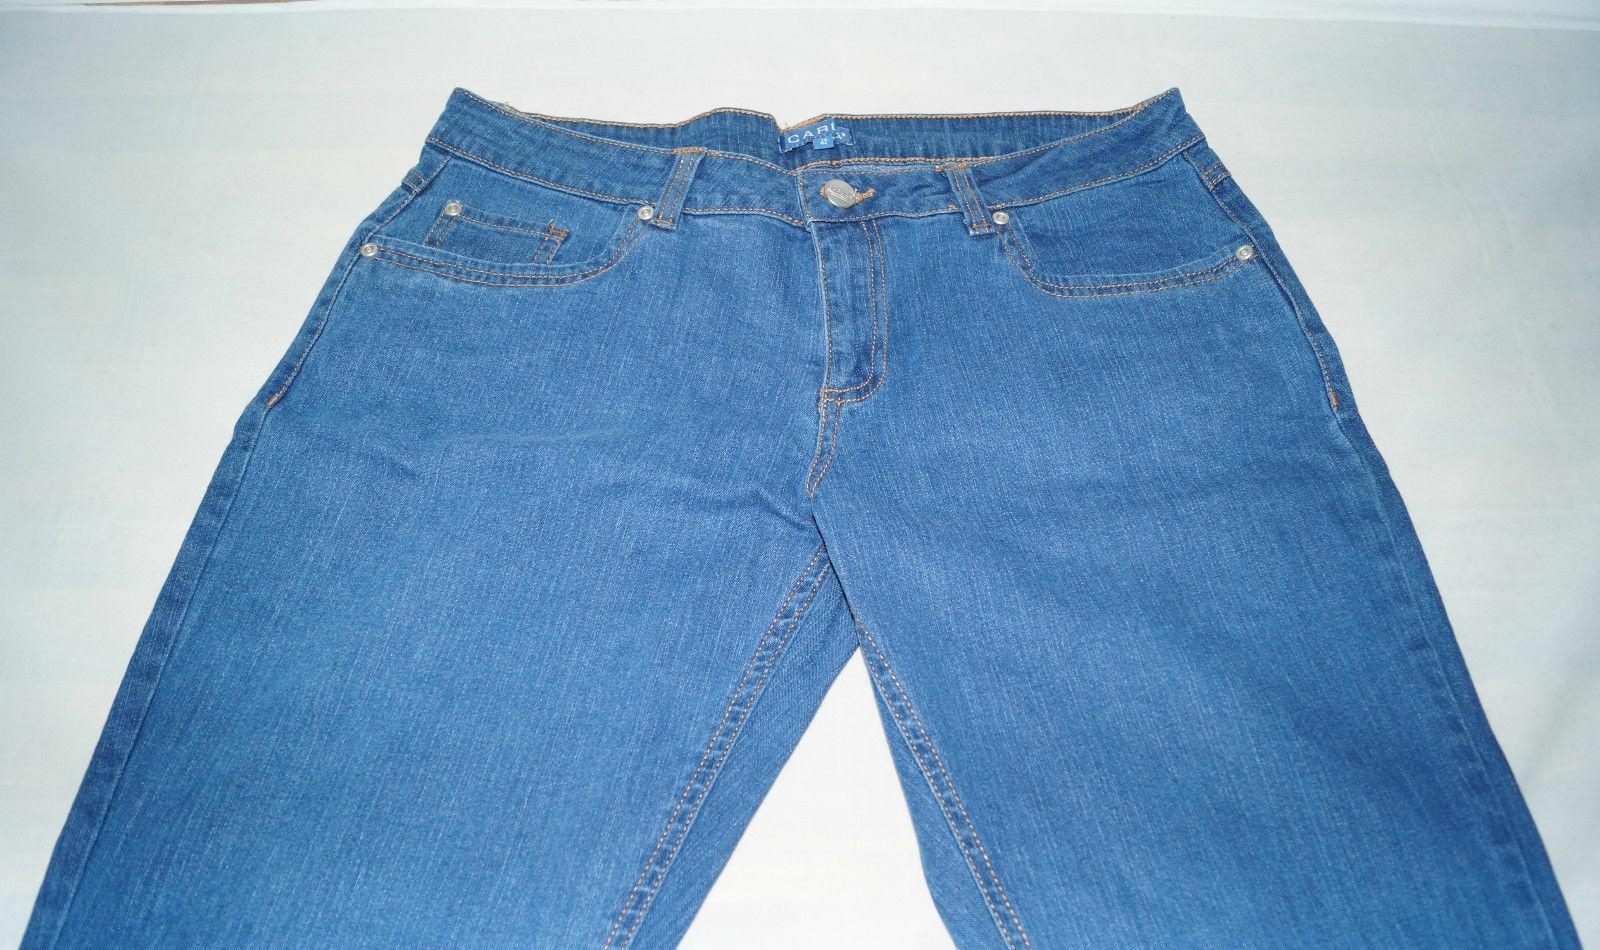 Damen-Stretch-Jeans-9-versch-Modelle-Jeanshose-Hose-Elasthan-bequem-Oko-Tex Indexbild 15